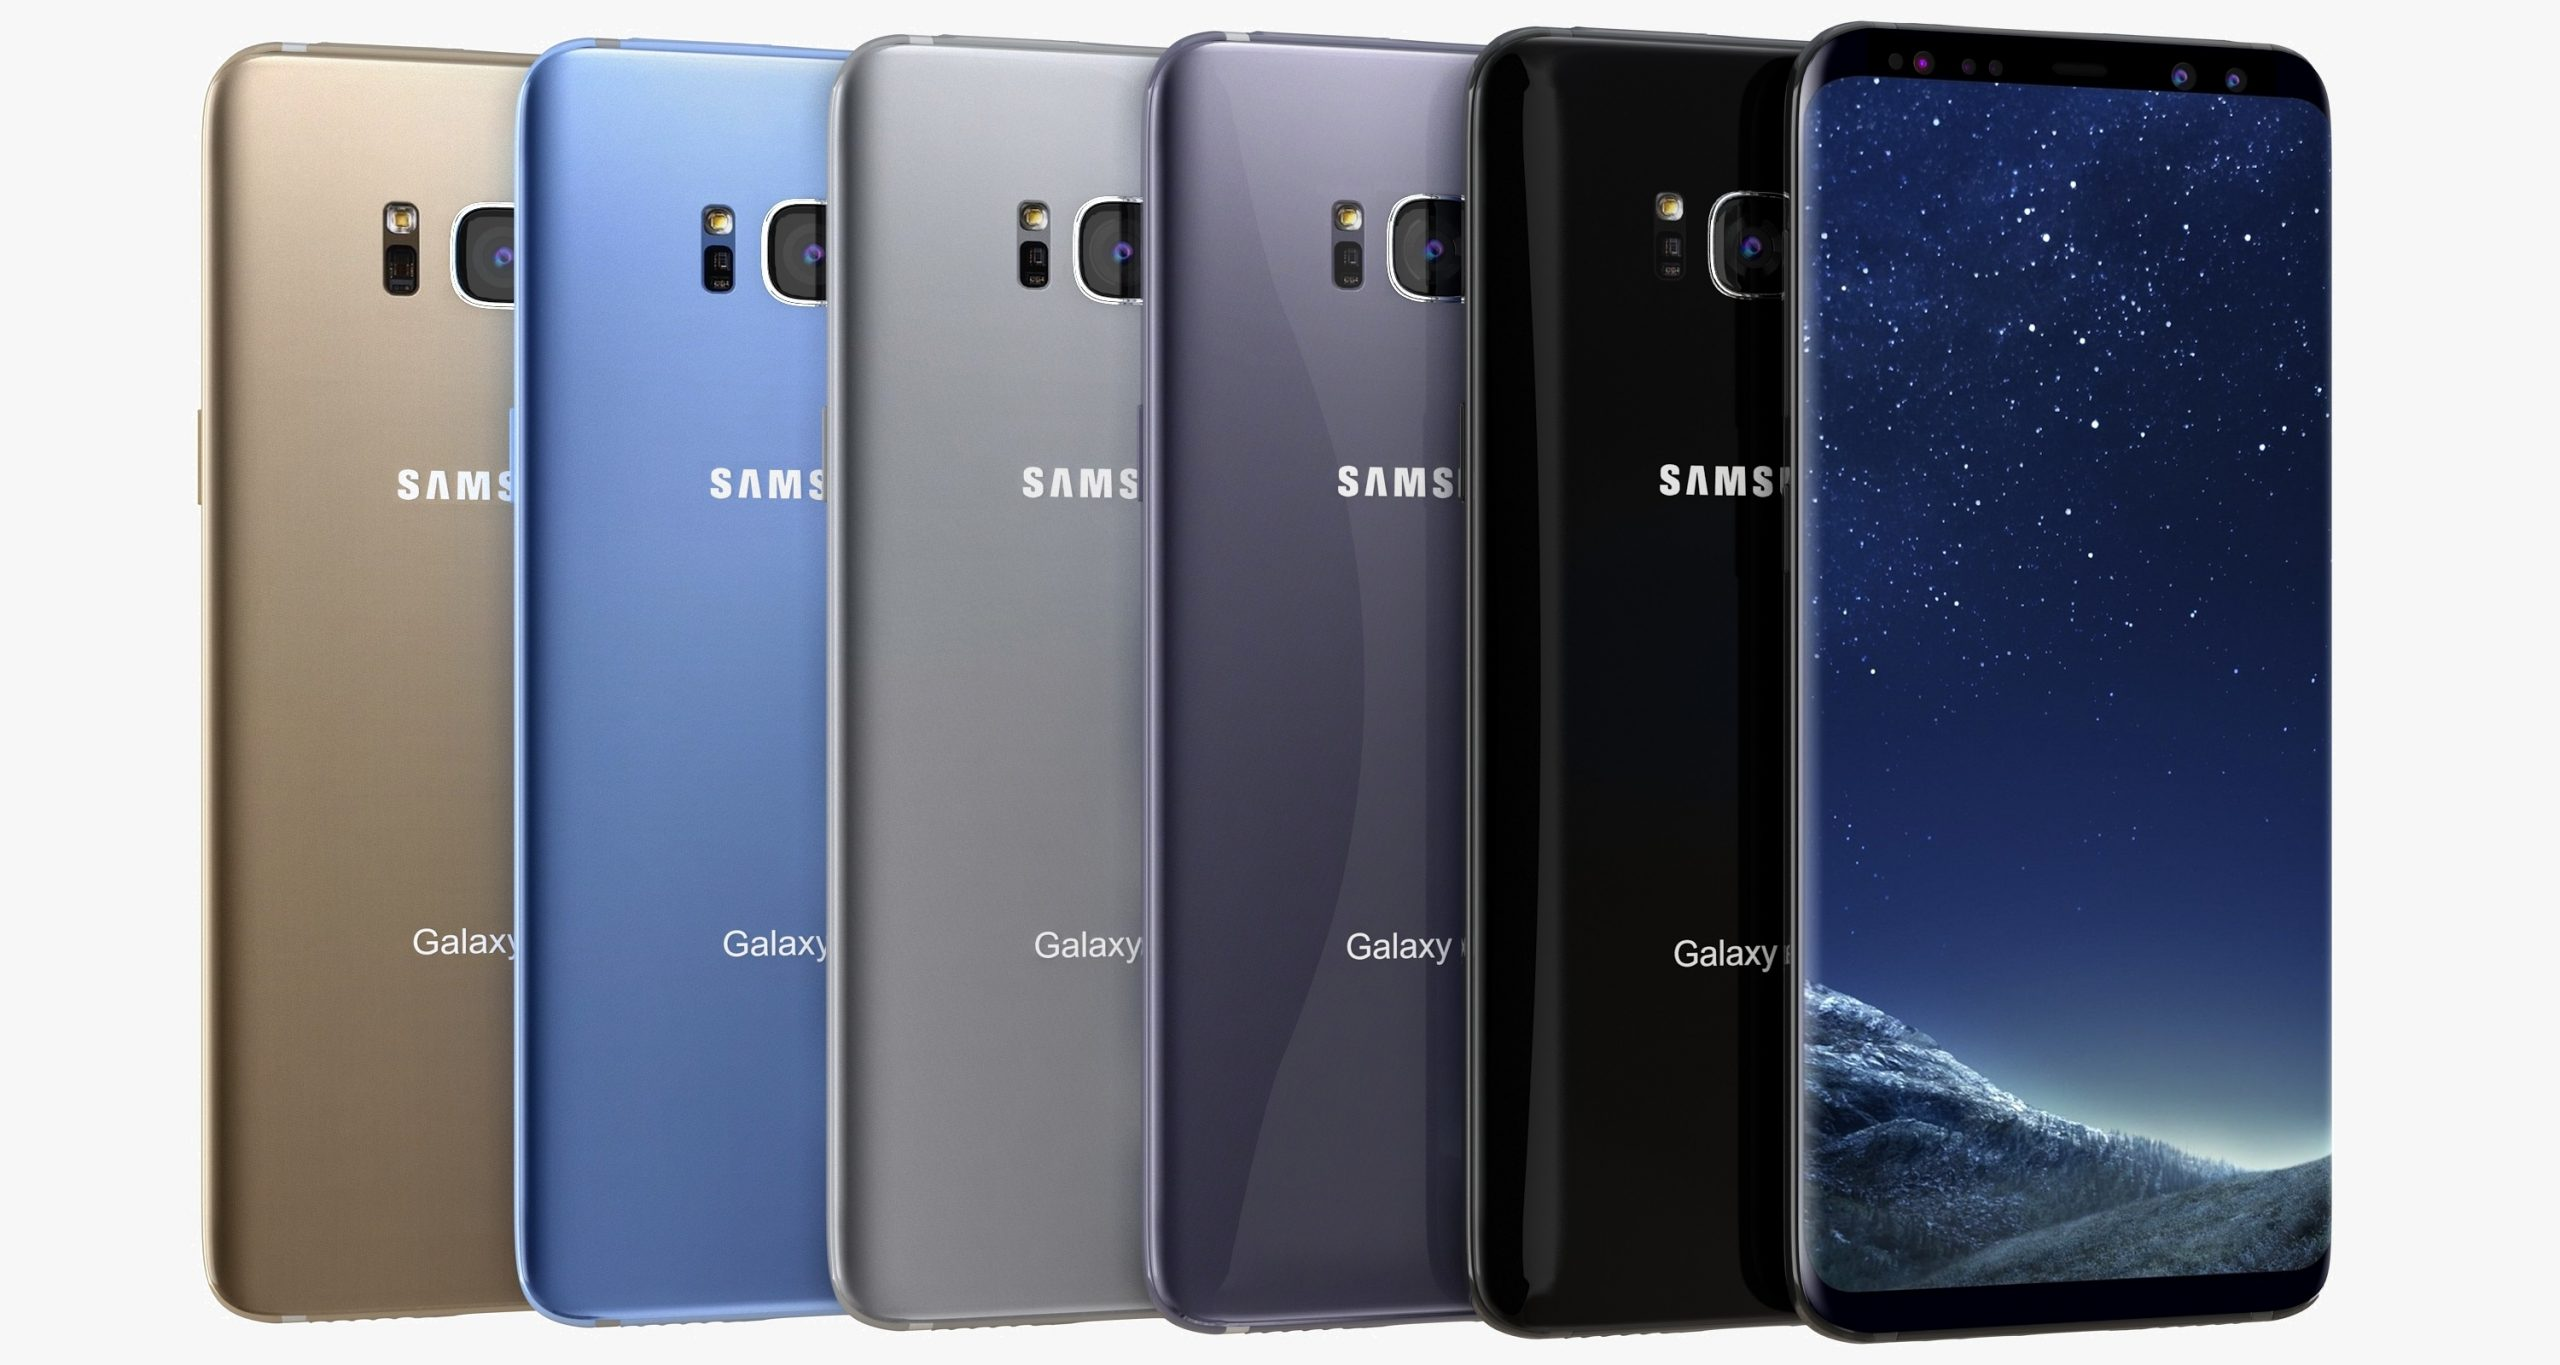 Обзор флагмана Samsung Galaxy S8, где купить